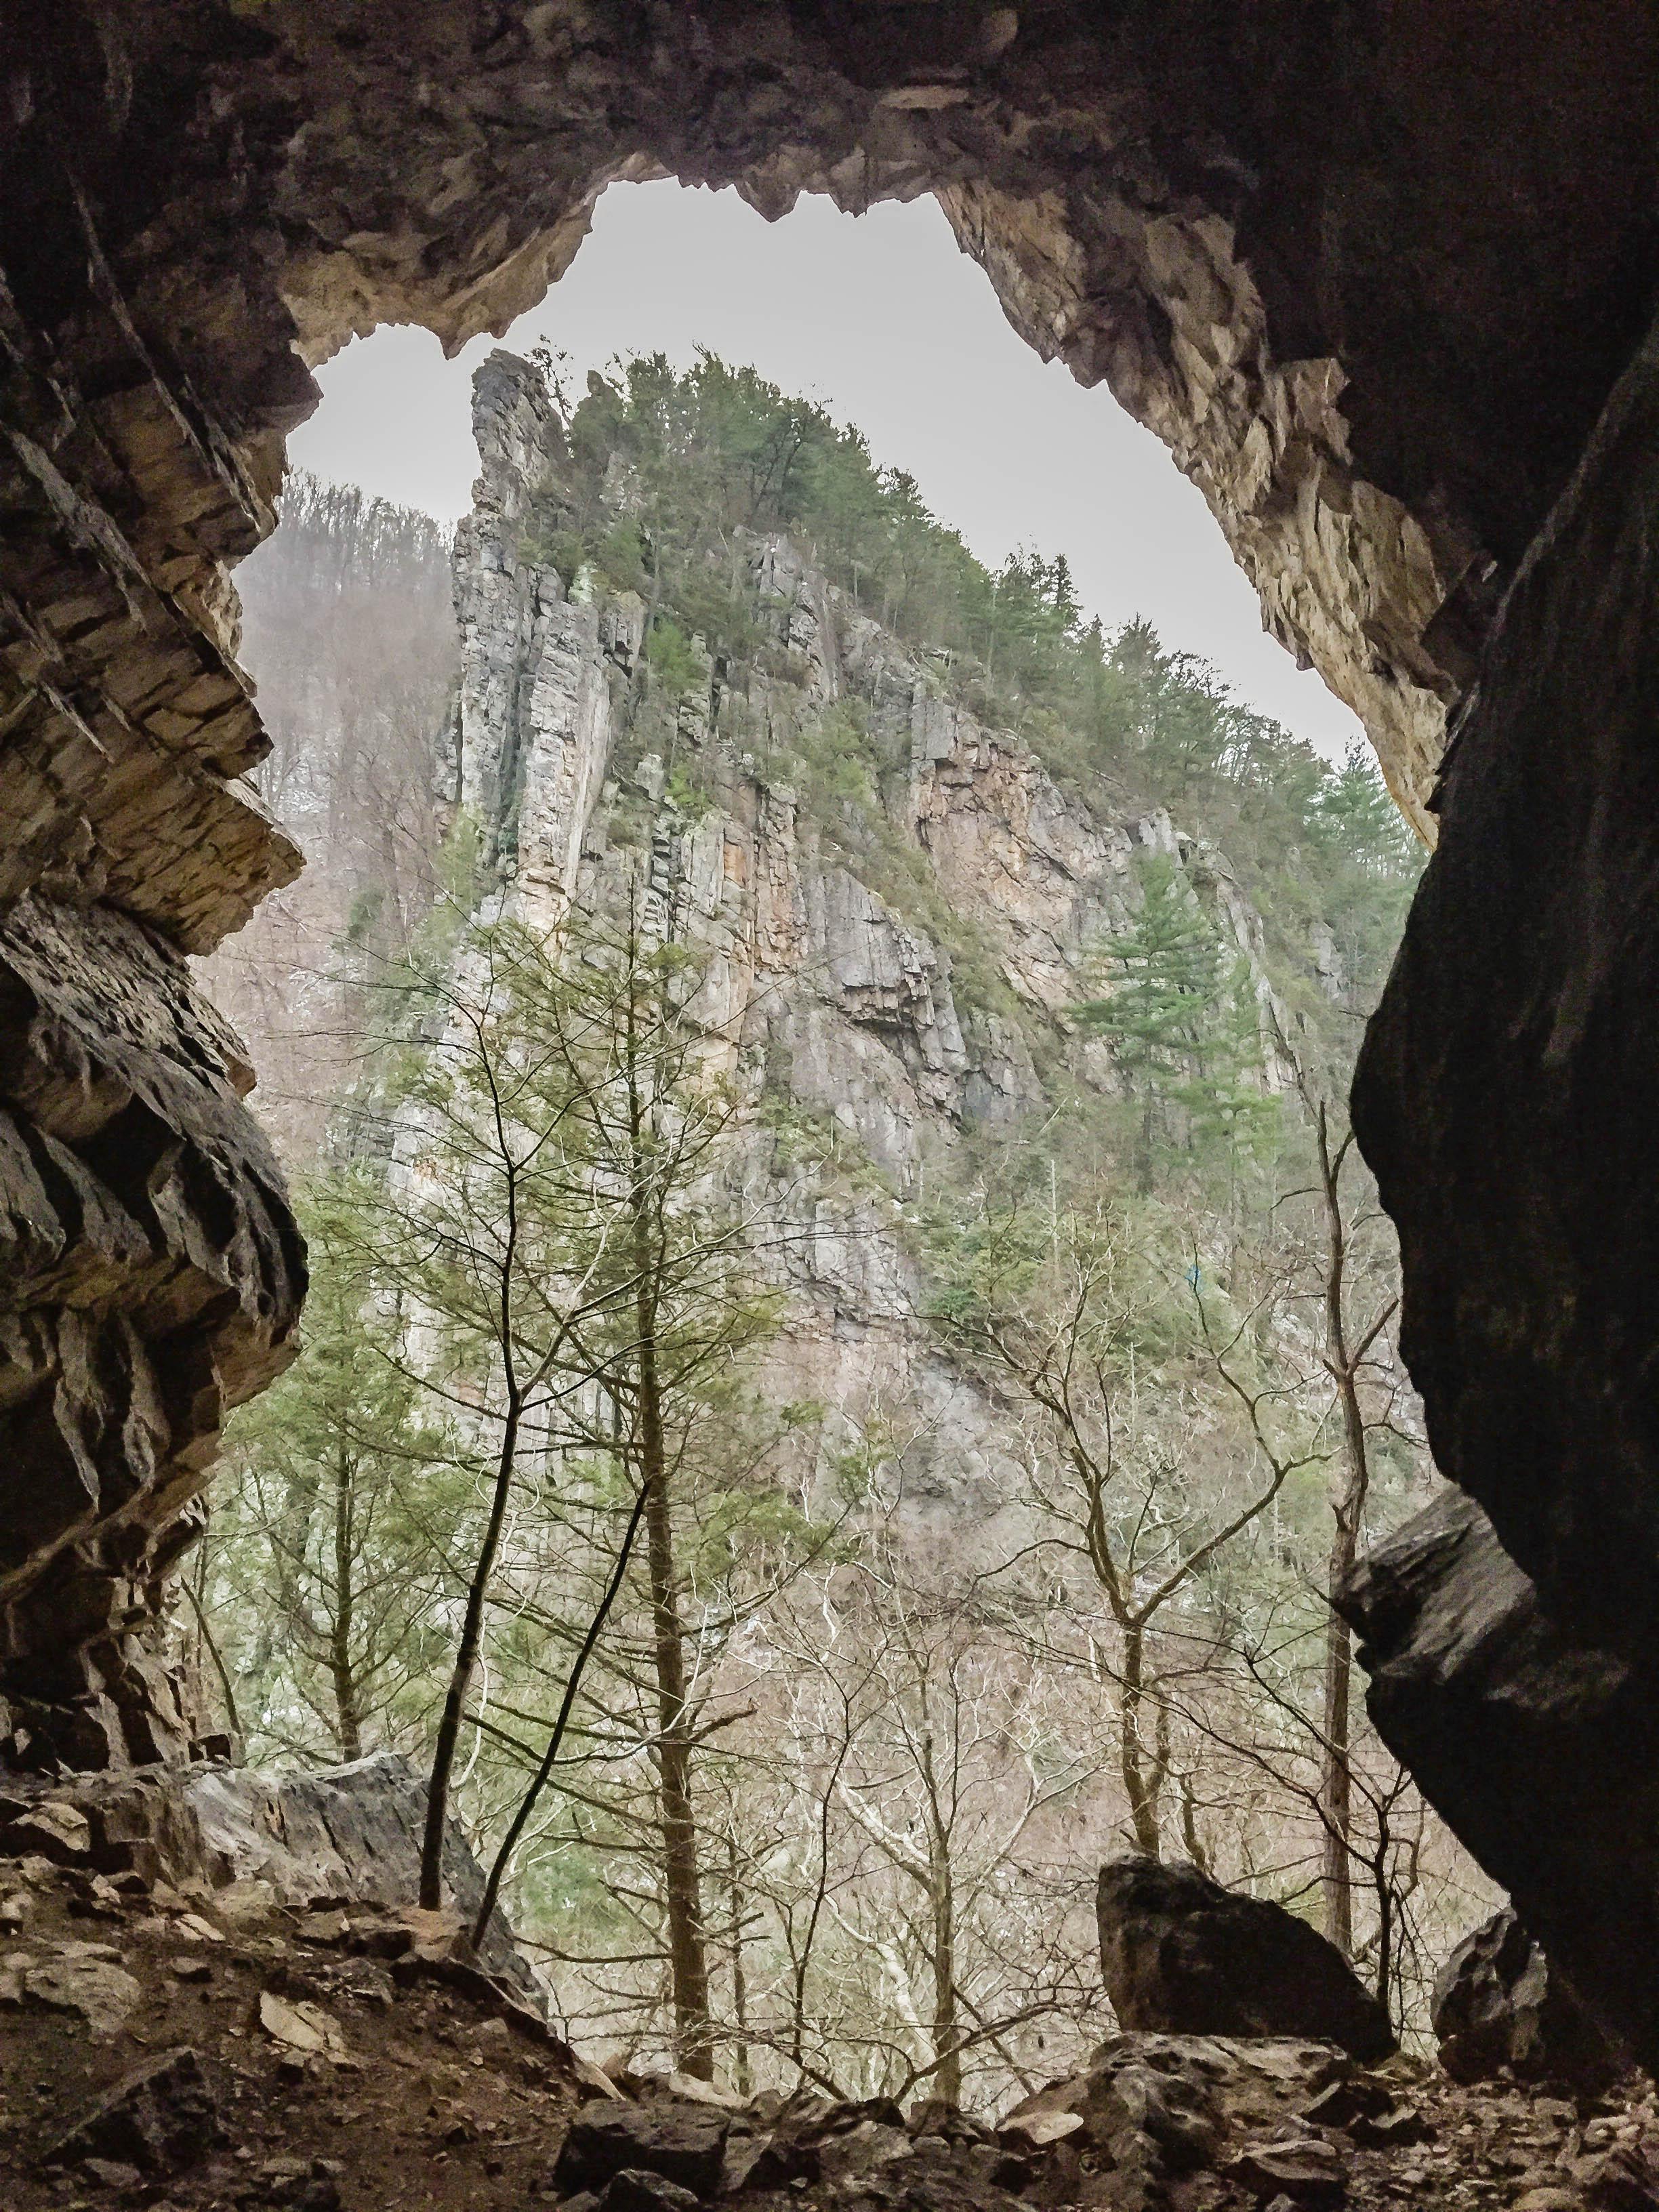 Cave at Seneca Rocks Trail (east side)